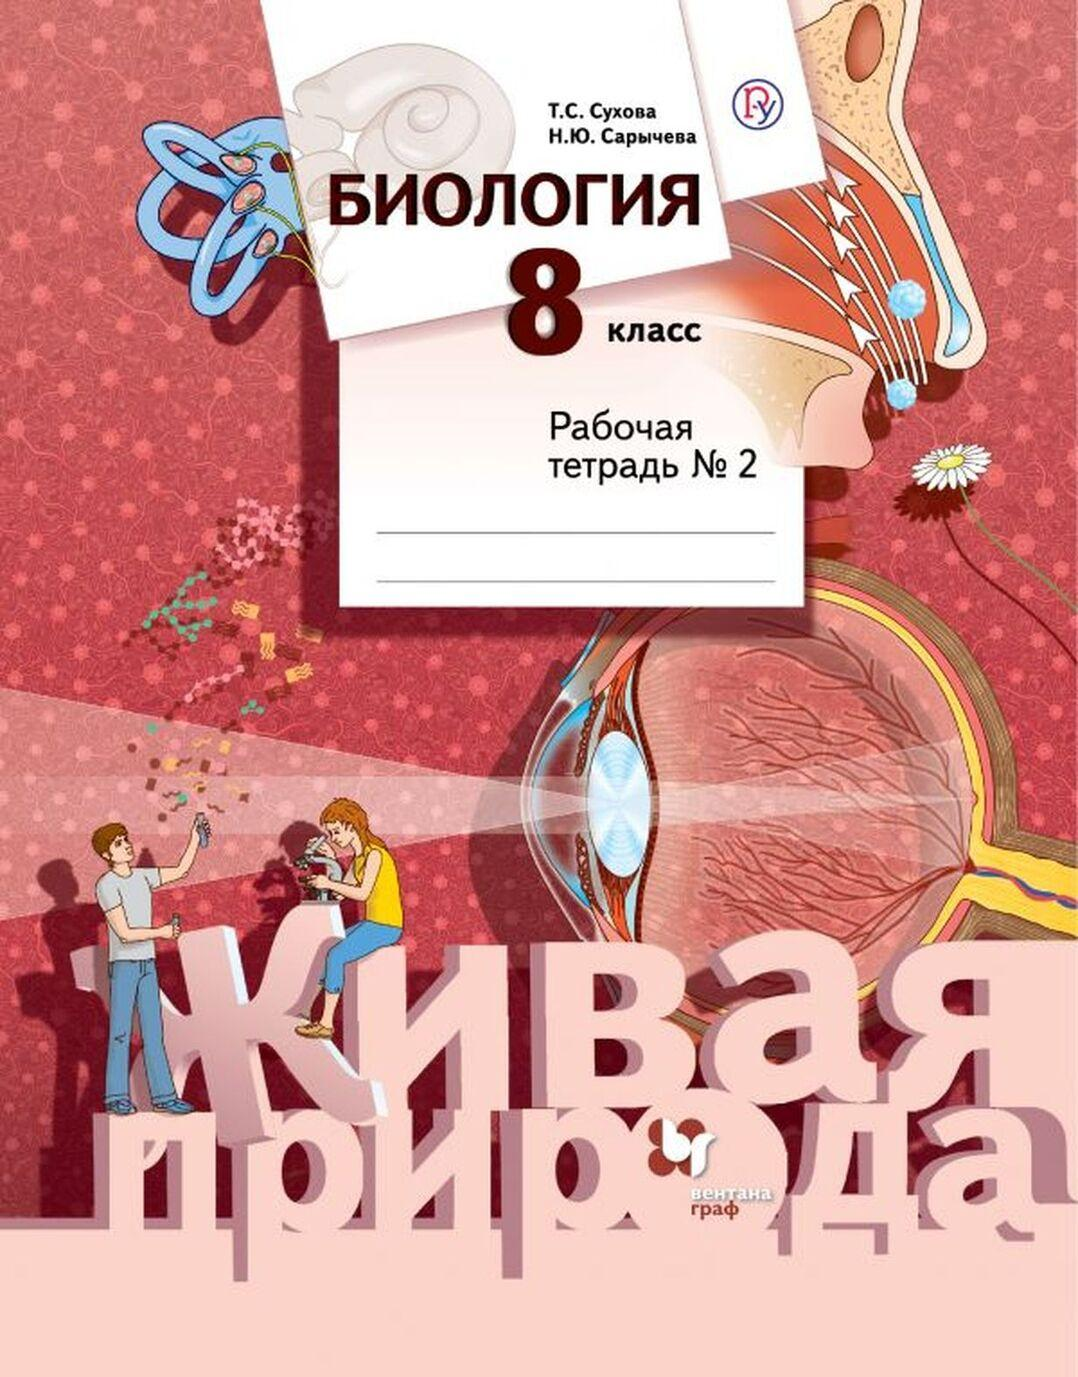 Biologija. 8 klass. Rabochaja tetrad № 2 | Sukhova Tamara Sergeevna, Sarycheva Natalija Jurevna